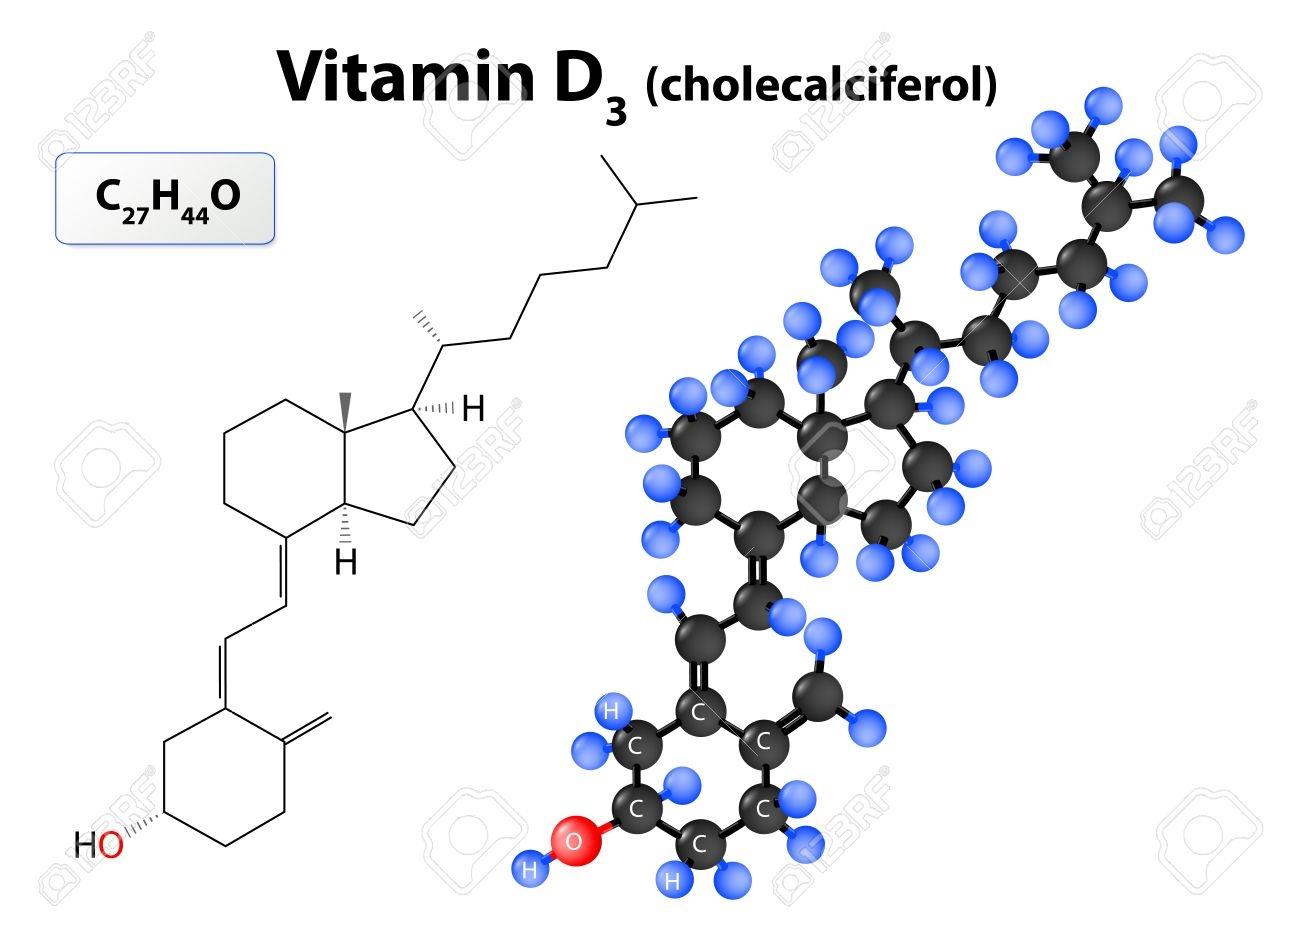 La vitamina D indispensable